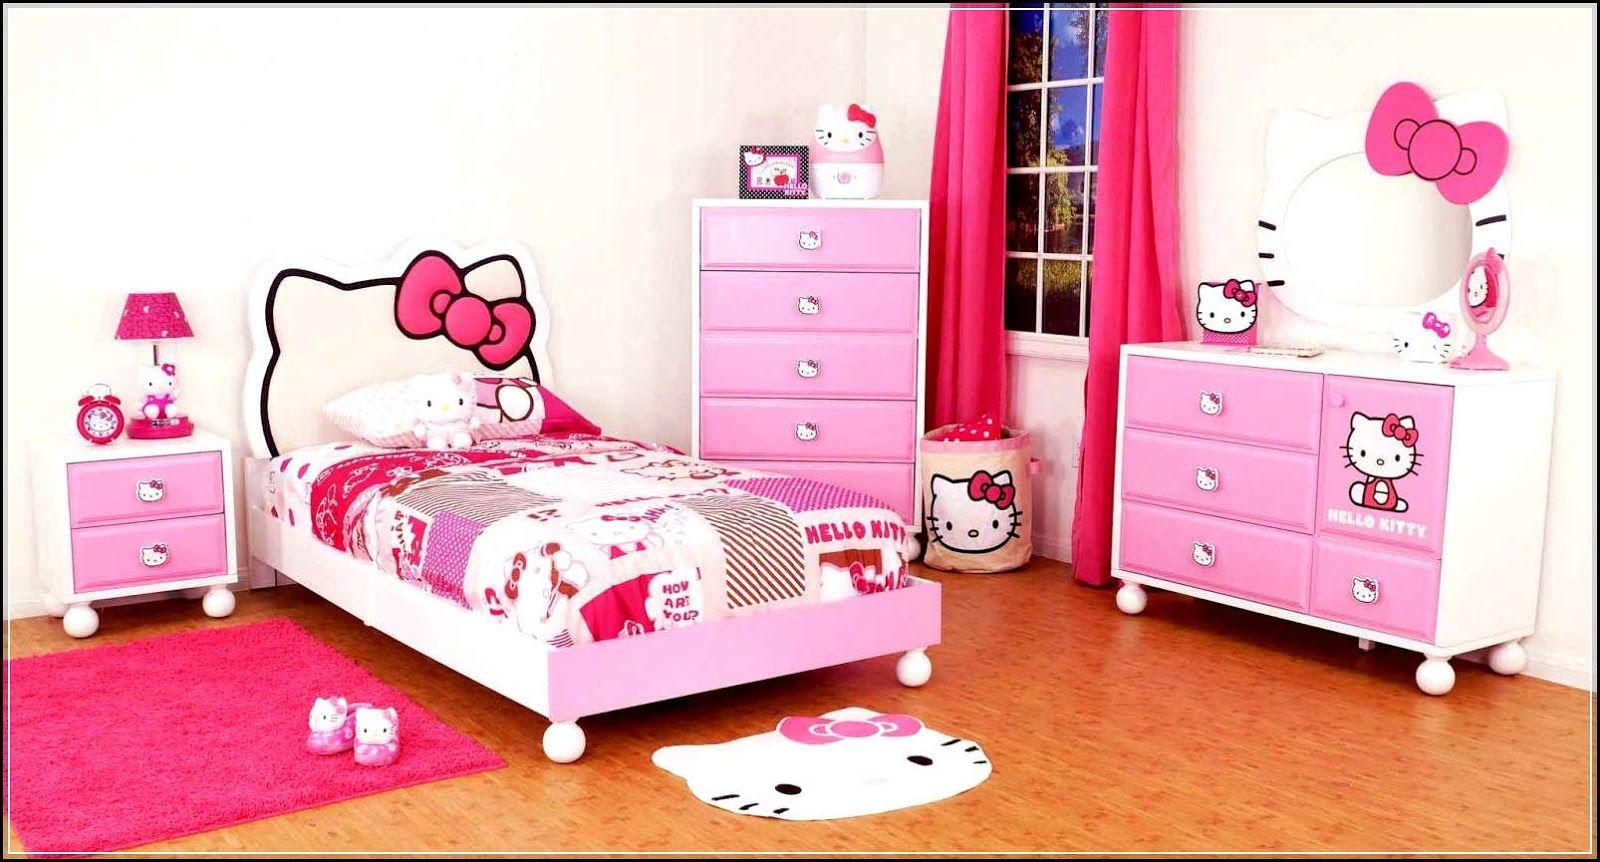 Kamar Tidur Minimalis Anak Perempuan  Hello kitty bed, Kamar